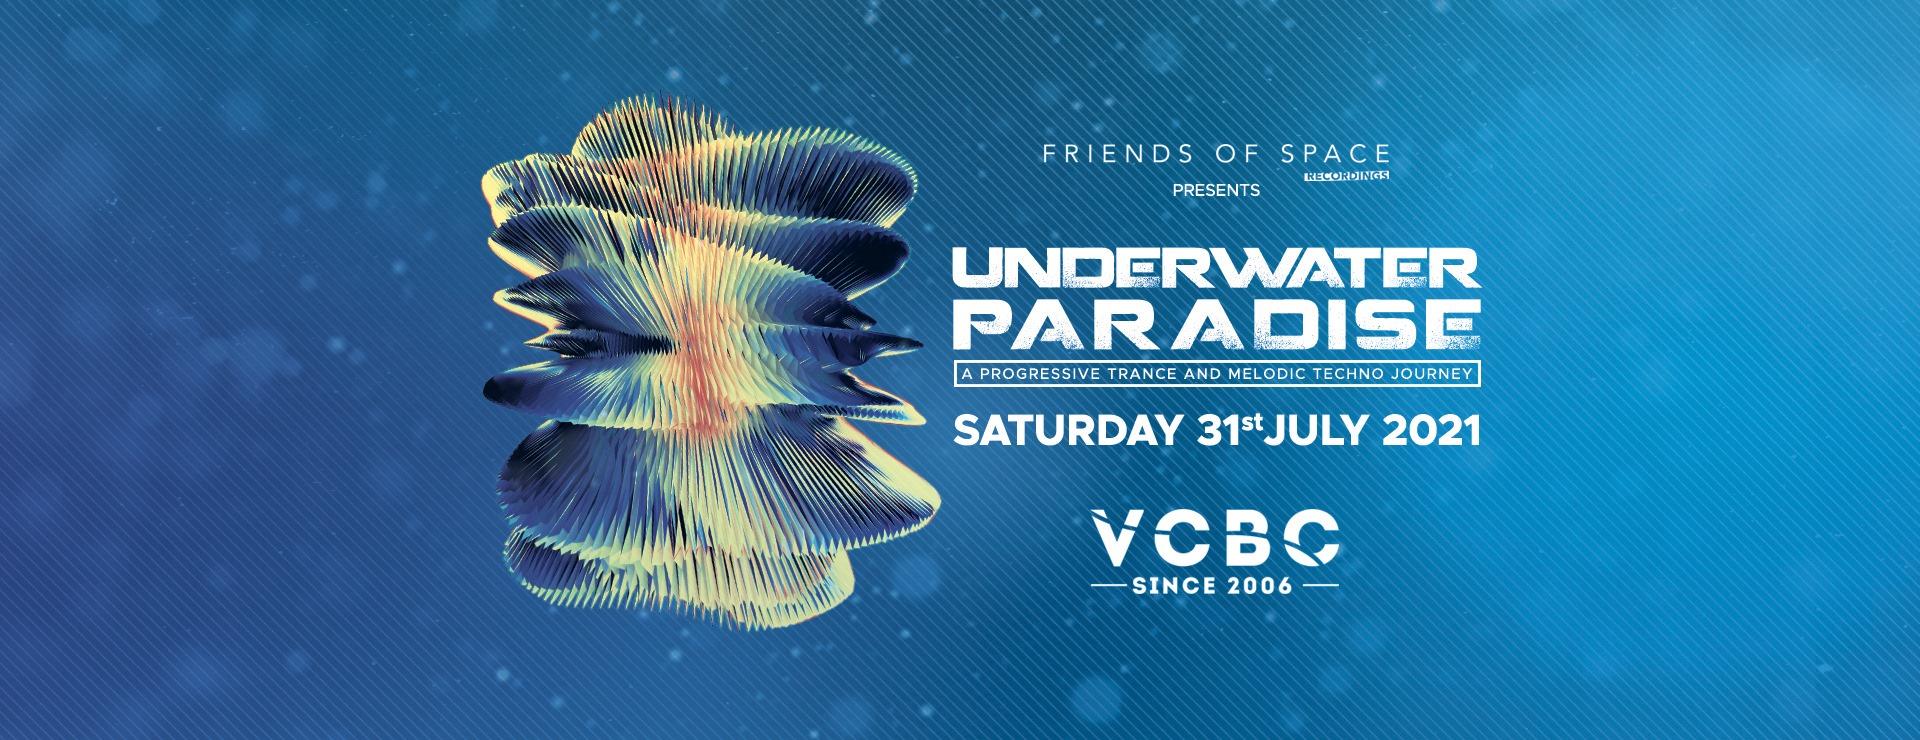 Events Wien: Underwater Paradise 2021